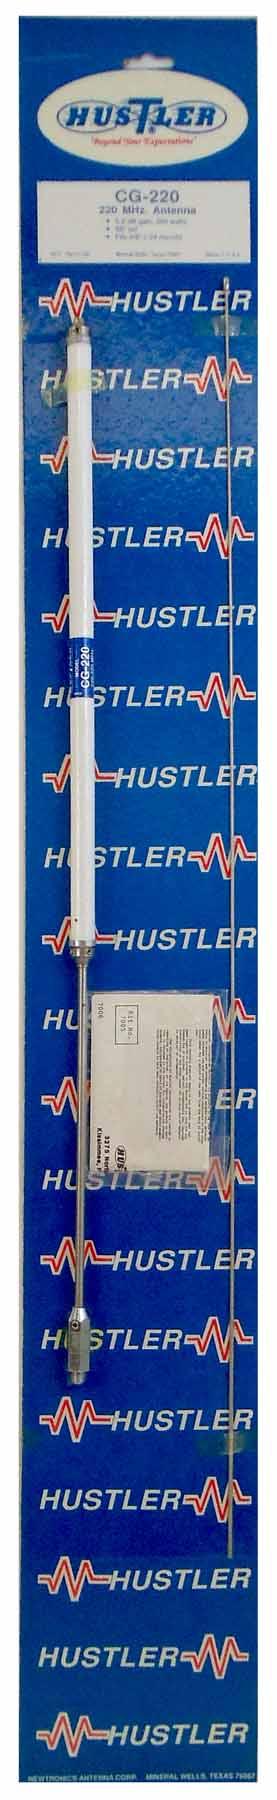 "CG220 - Hustler 58"" 200 Watt 5/8 Wave 220 MHZ Antenna"